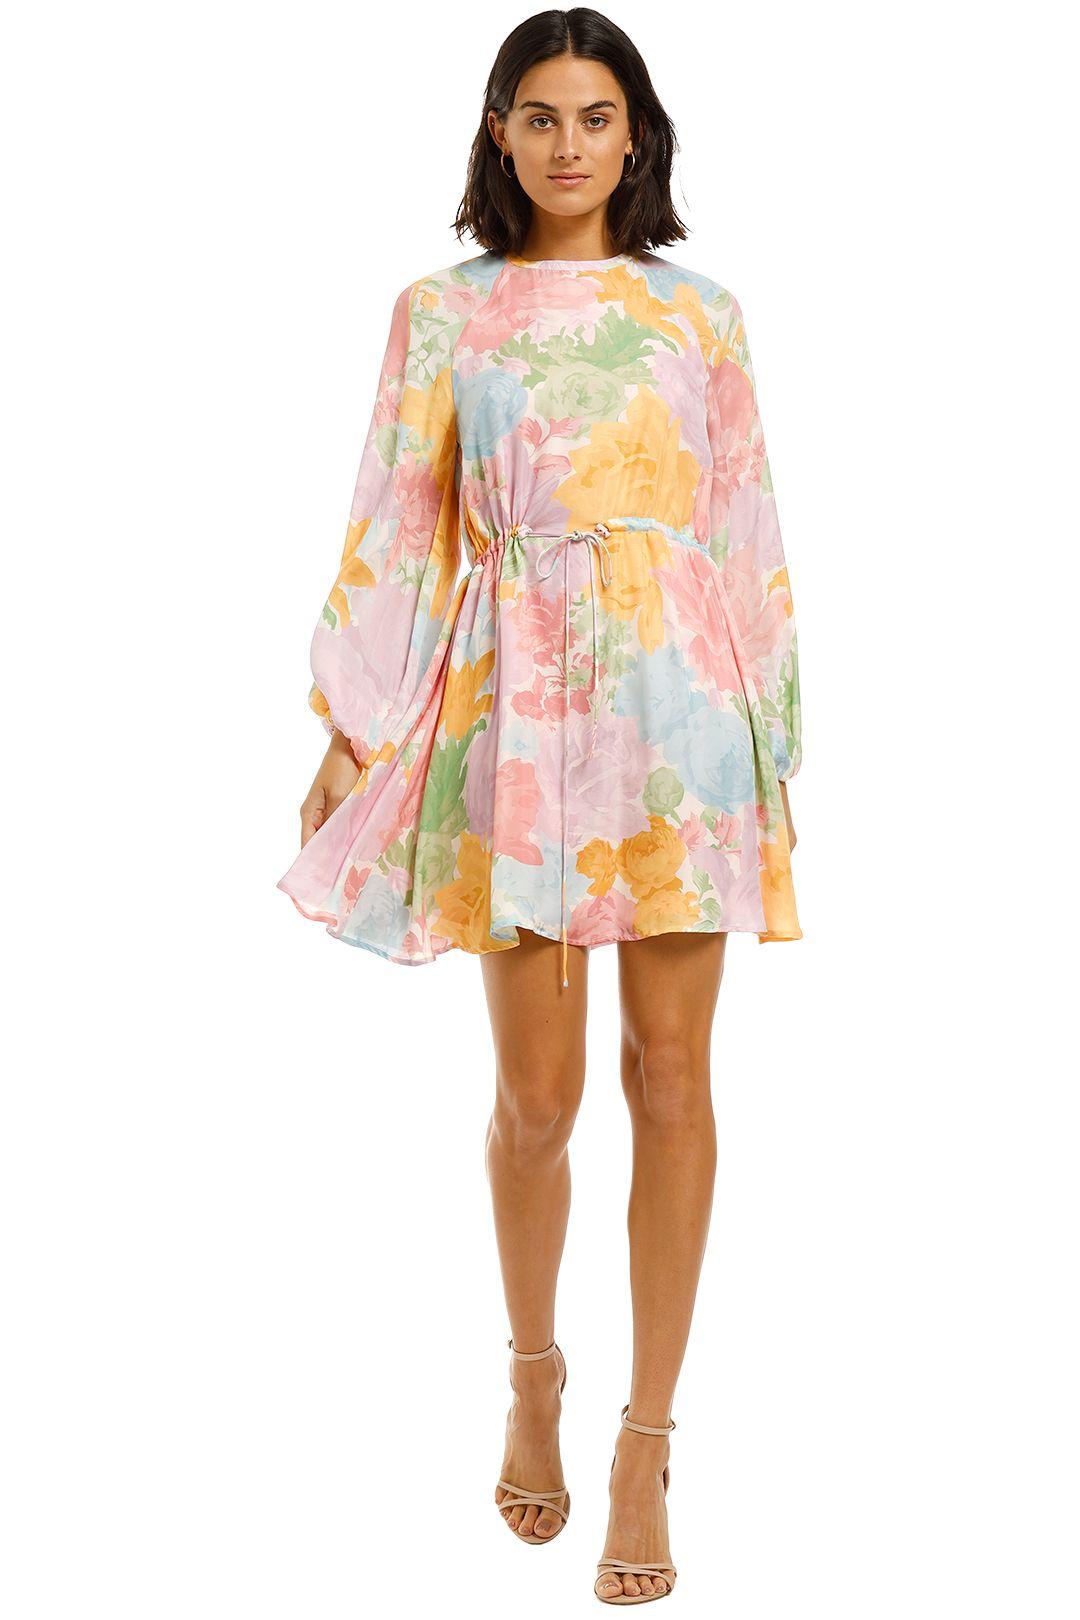 Stine-Goya-Coco-Dress-Rose-Garden-Pastel-Front